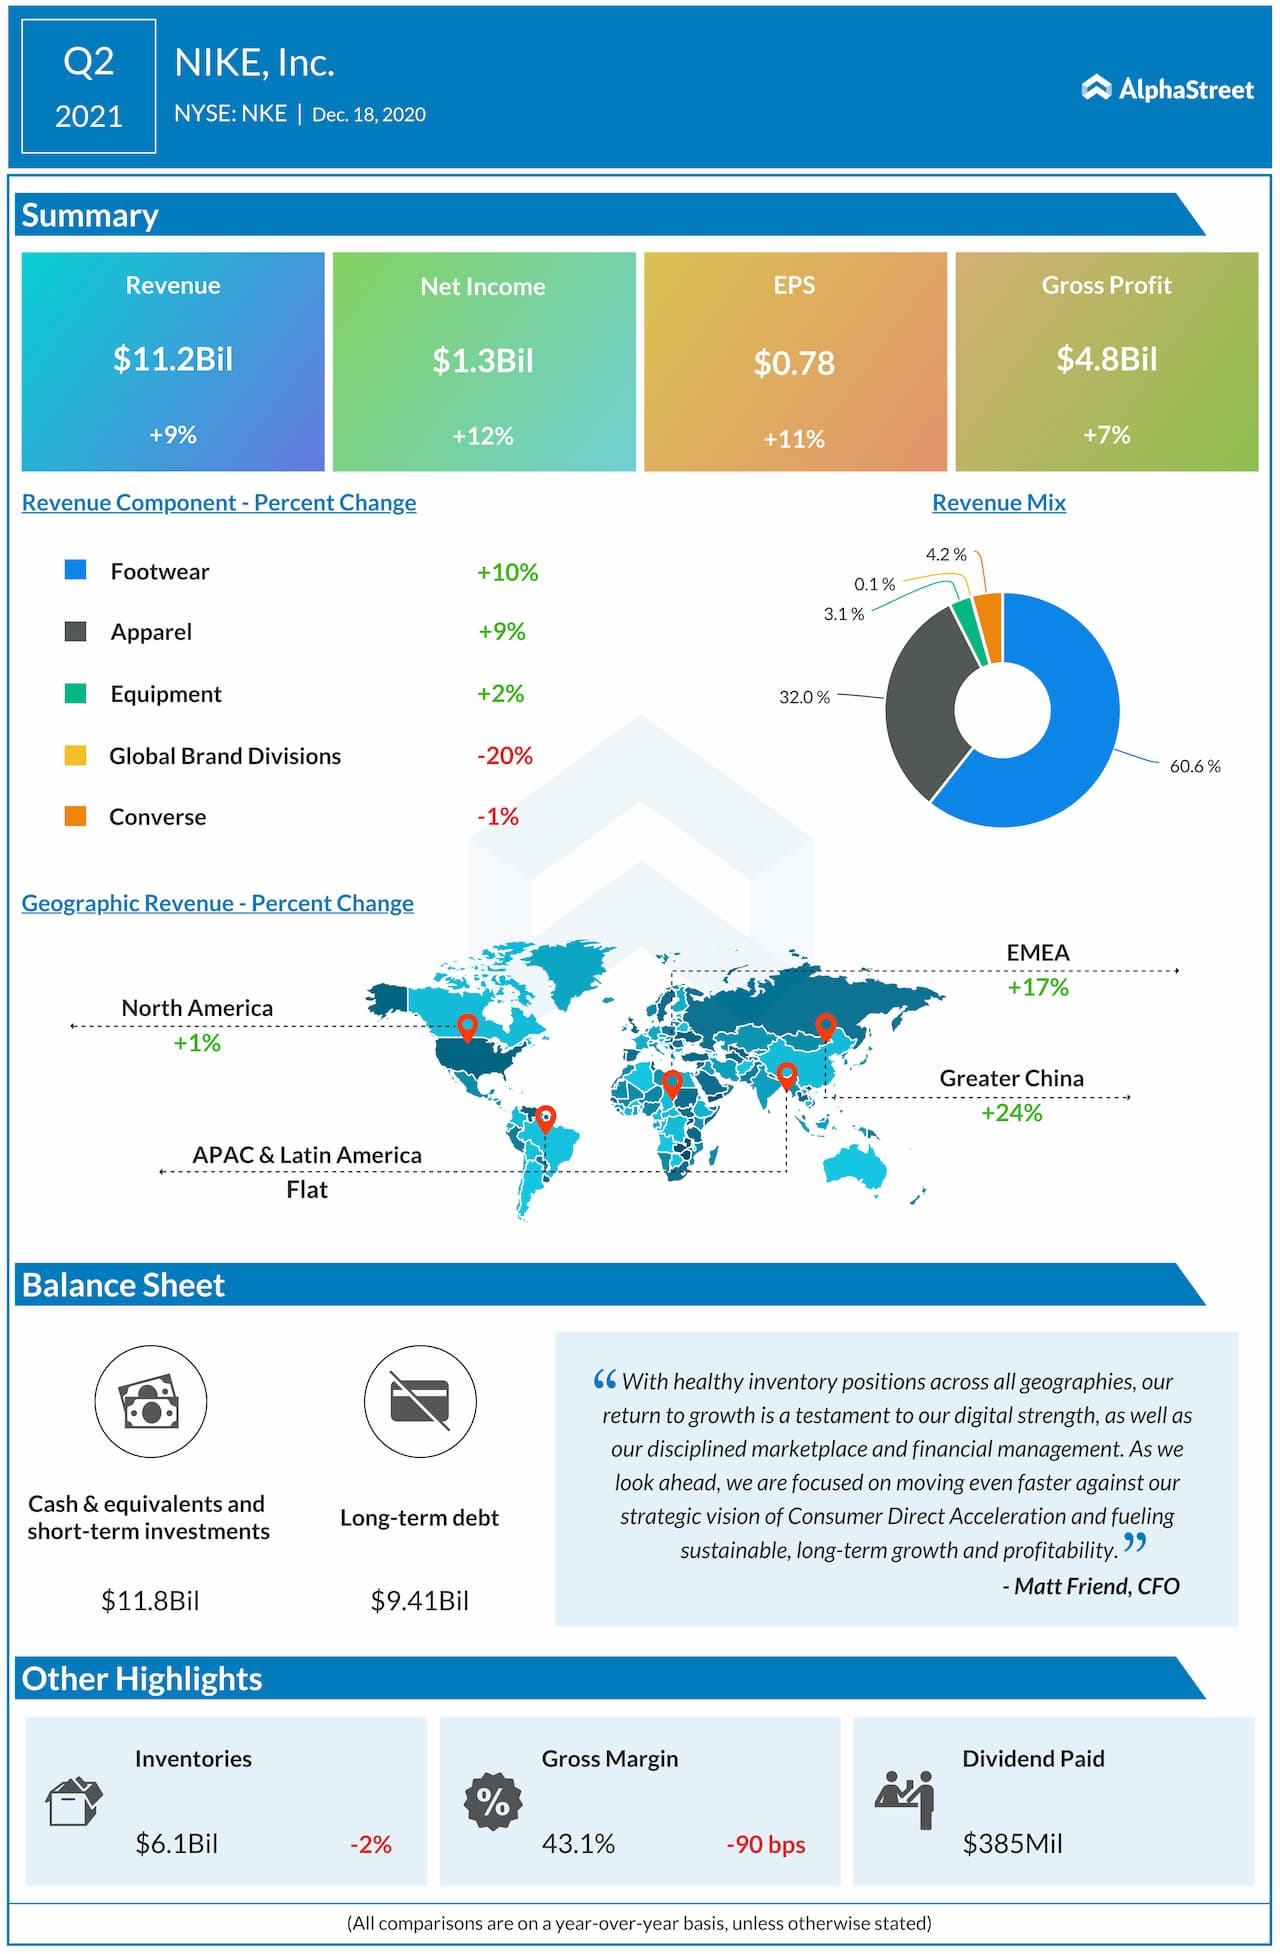 Nike Q2 2021 earnings infographic